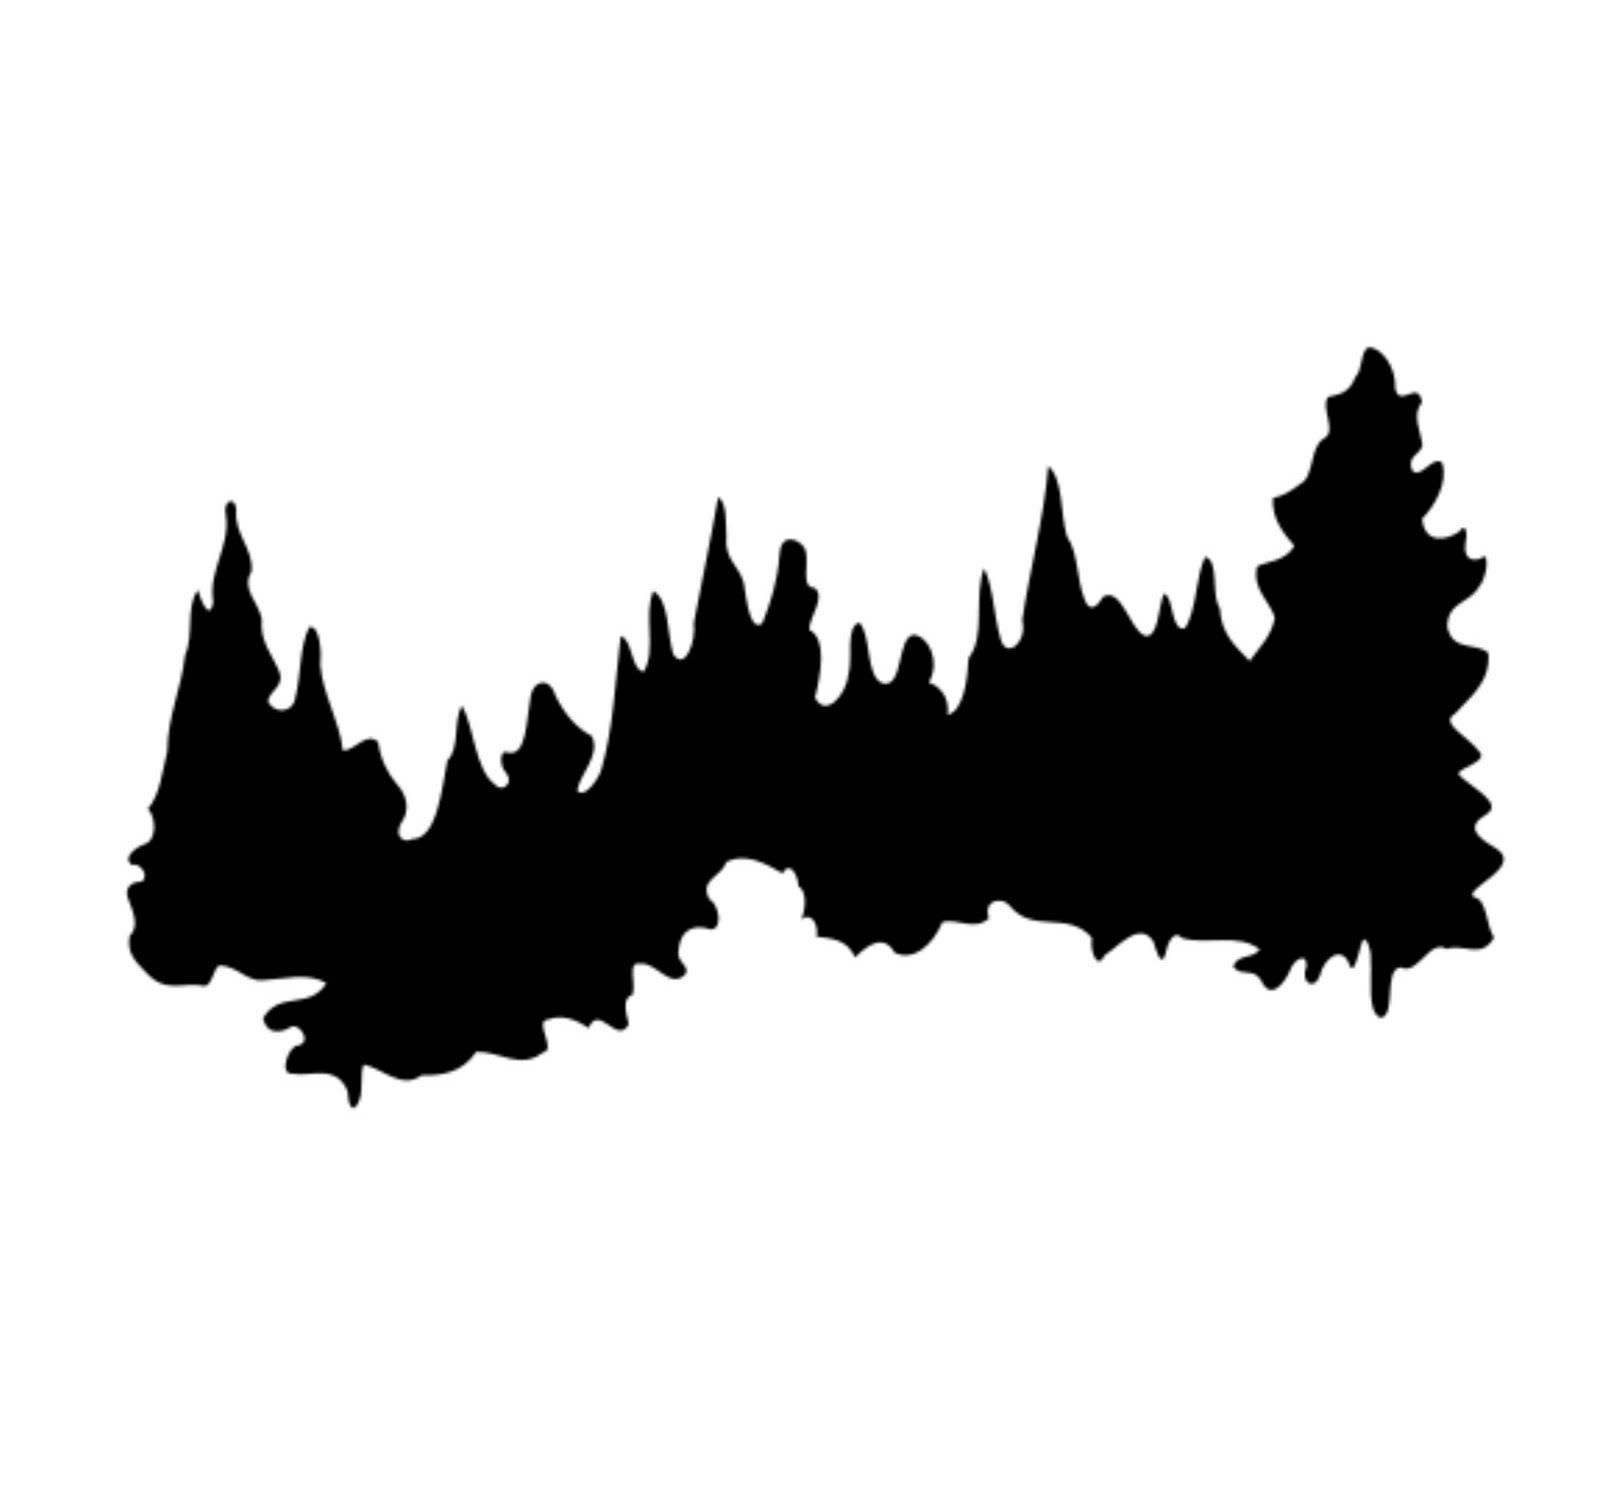 1600x1497 Treeline Silhouette Clipart